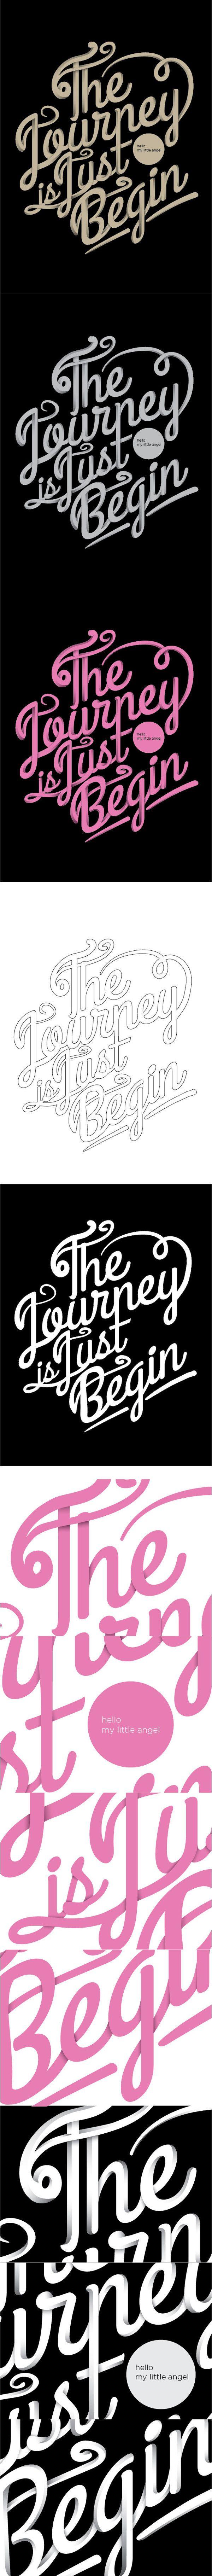 the journey is just begin by luigi oriza, via Behance